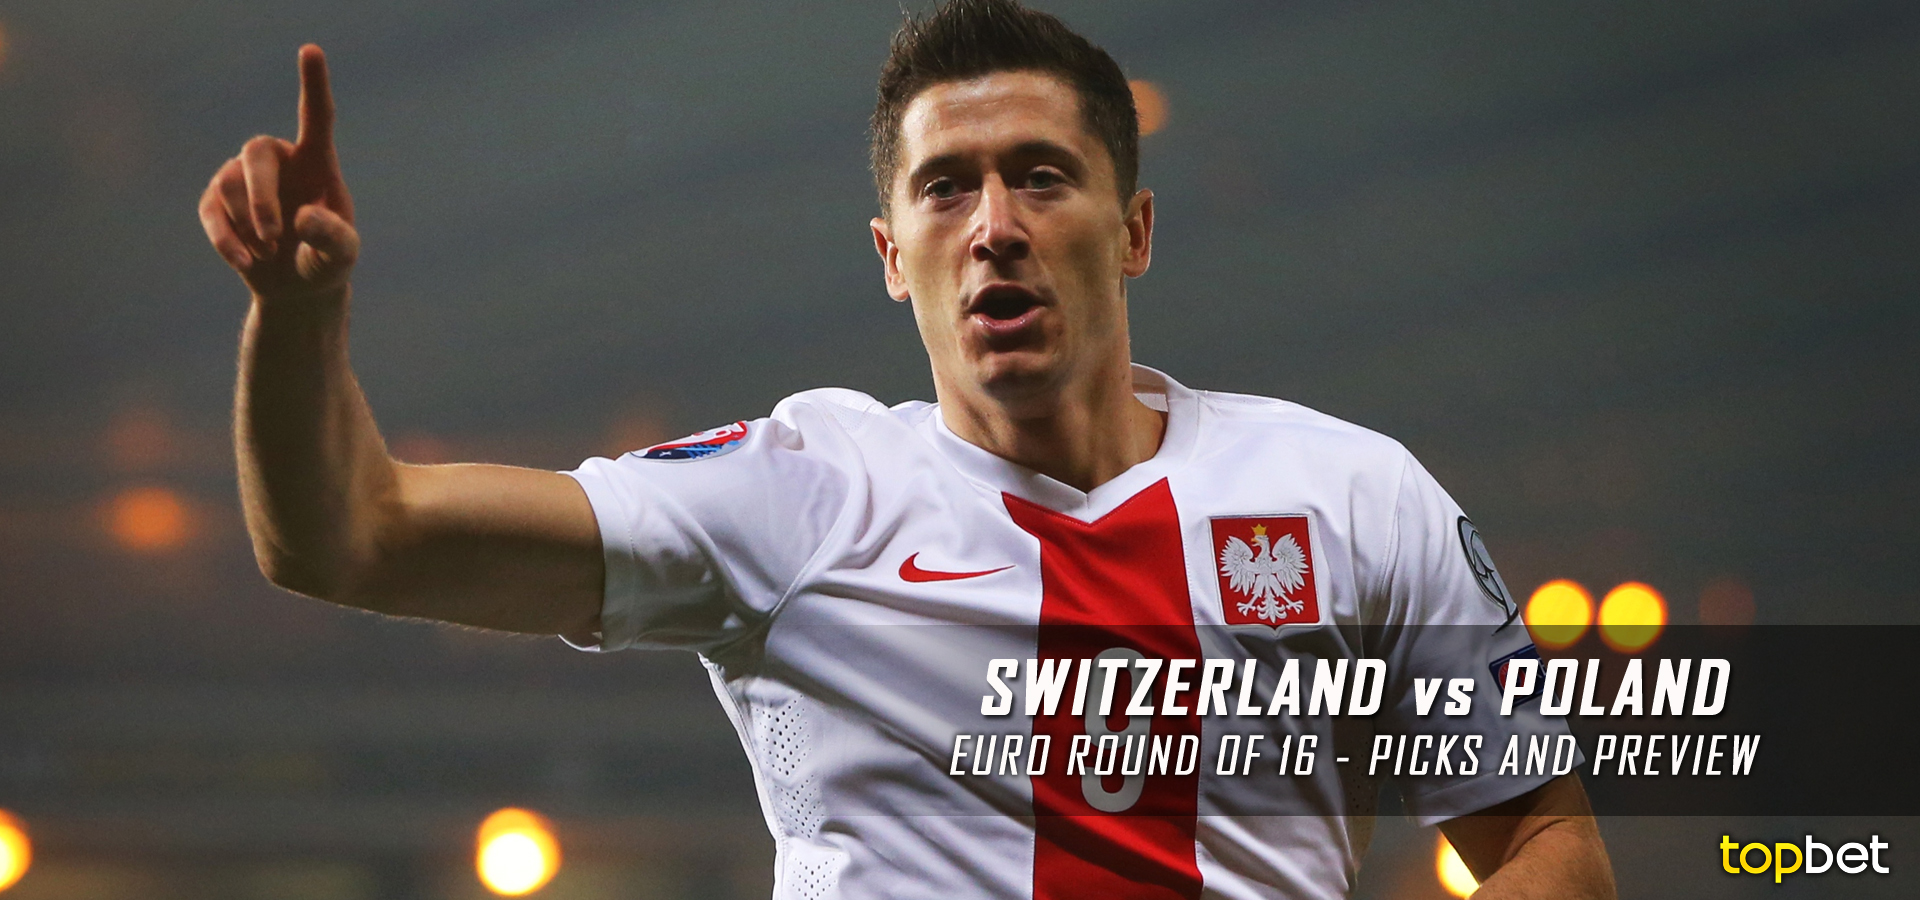 Switzerland vs Poland 2016 Euro Cup Round of 16 Predictions